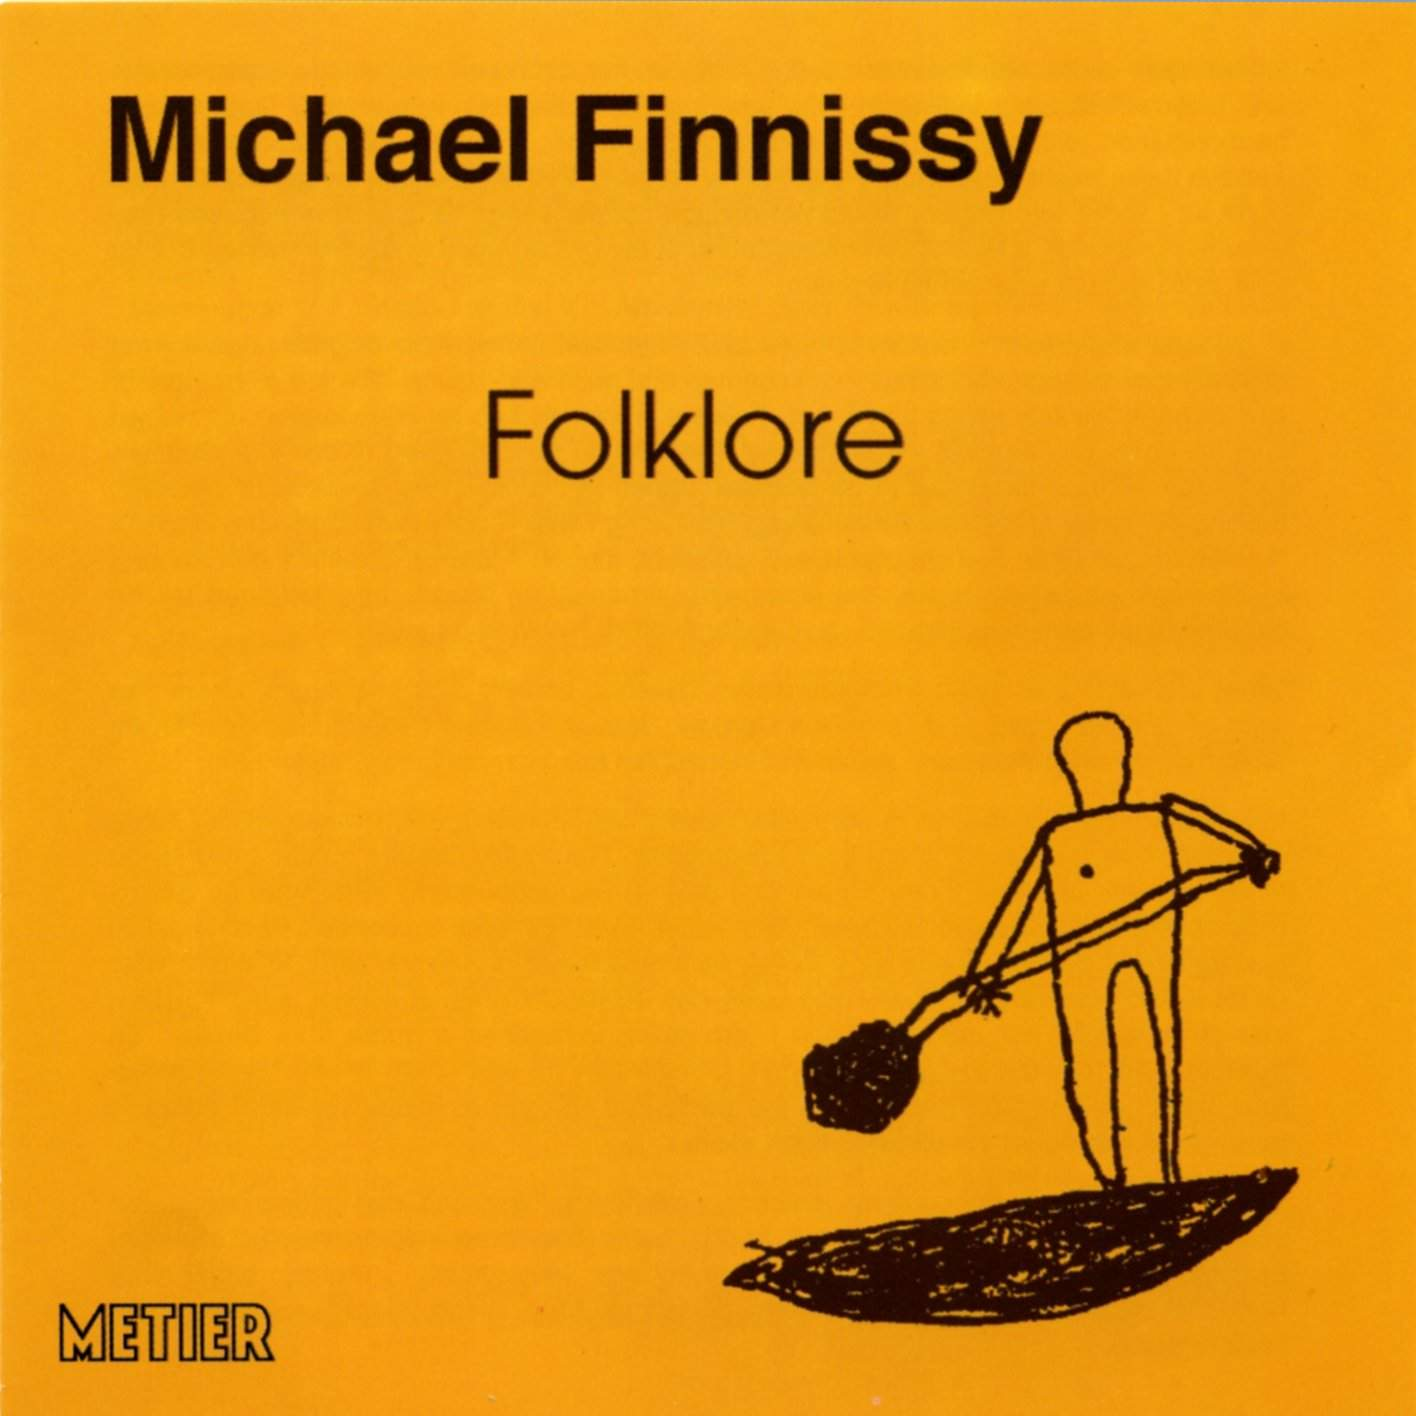 Michael Finnissy: Folklore